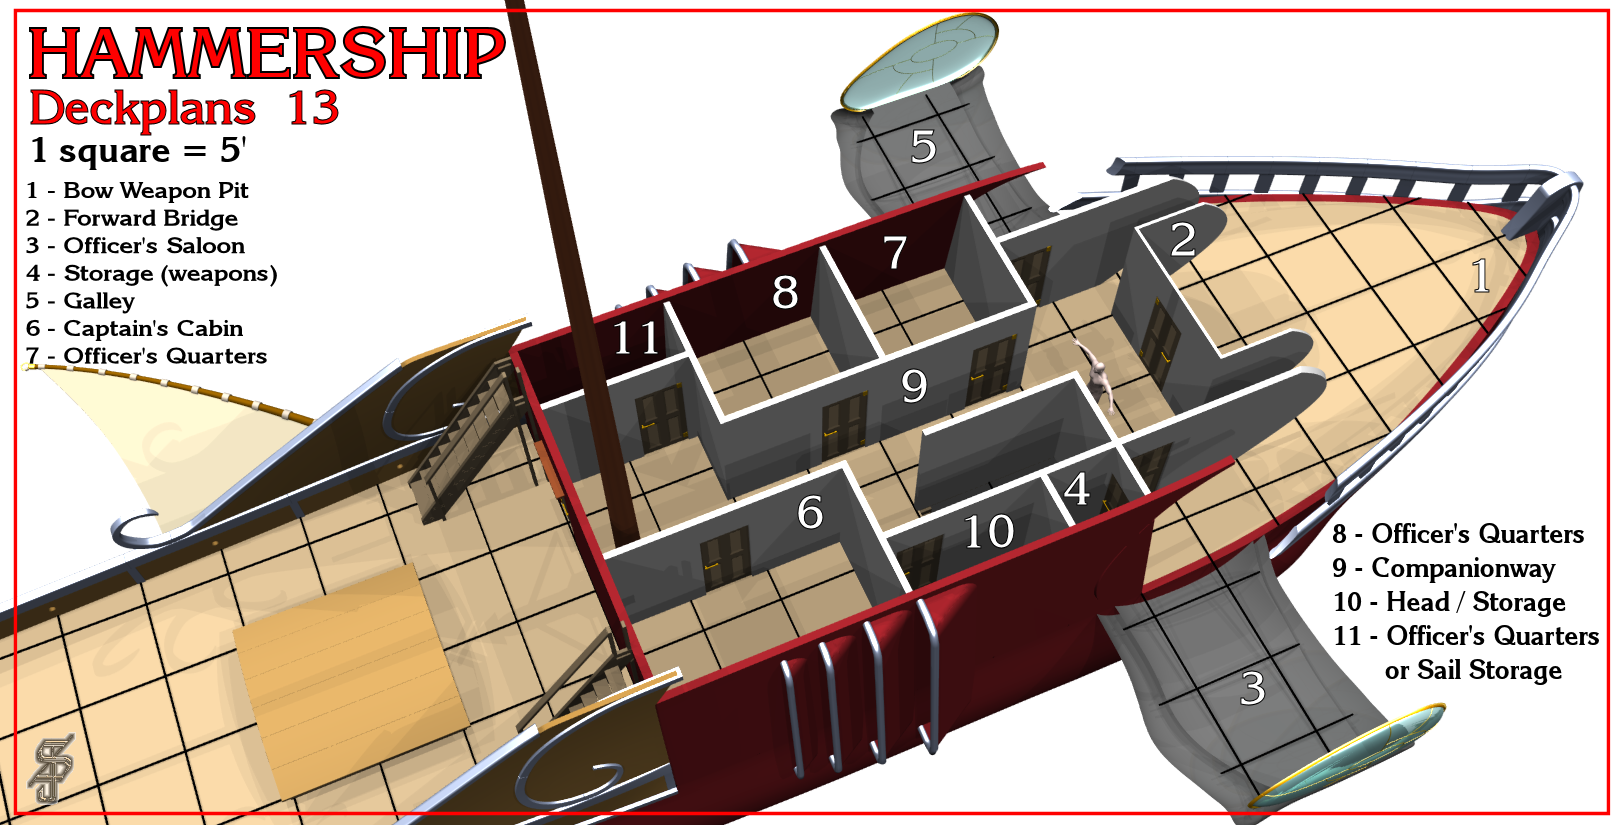 Hammership layout 13